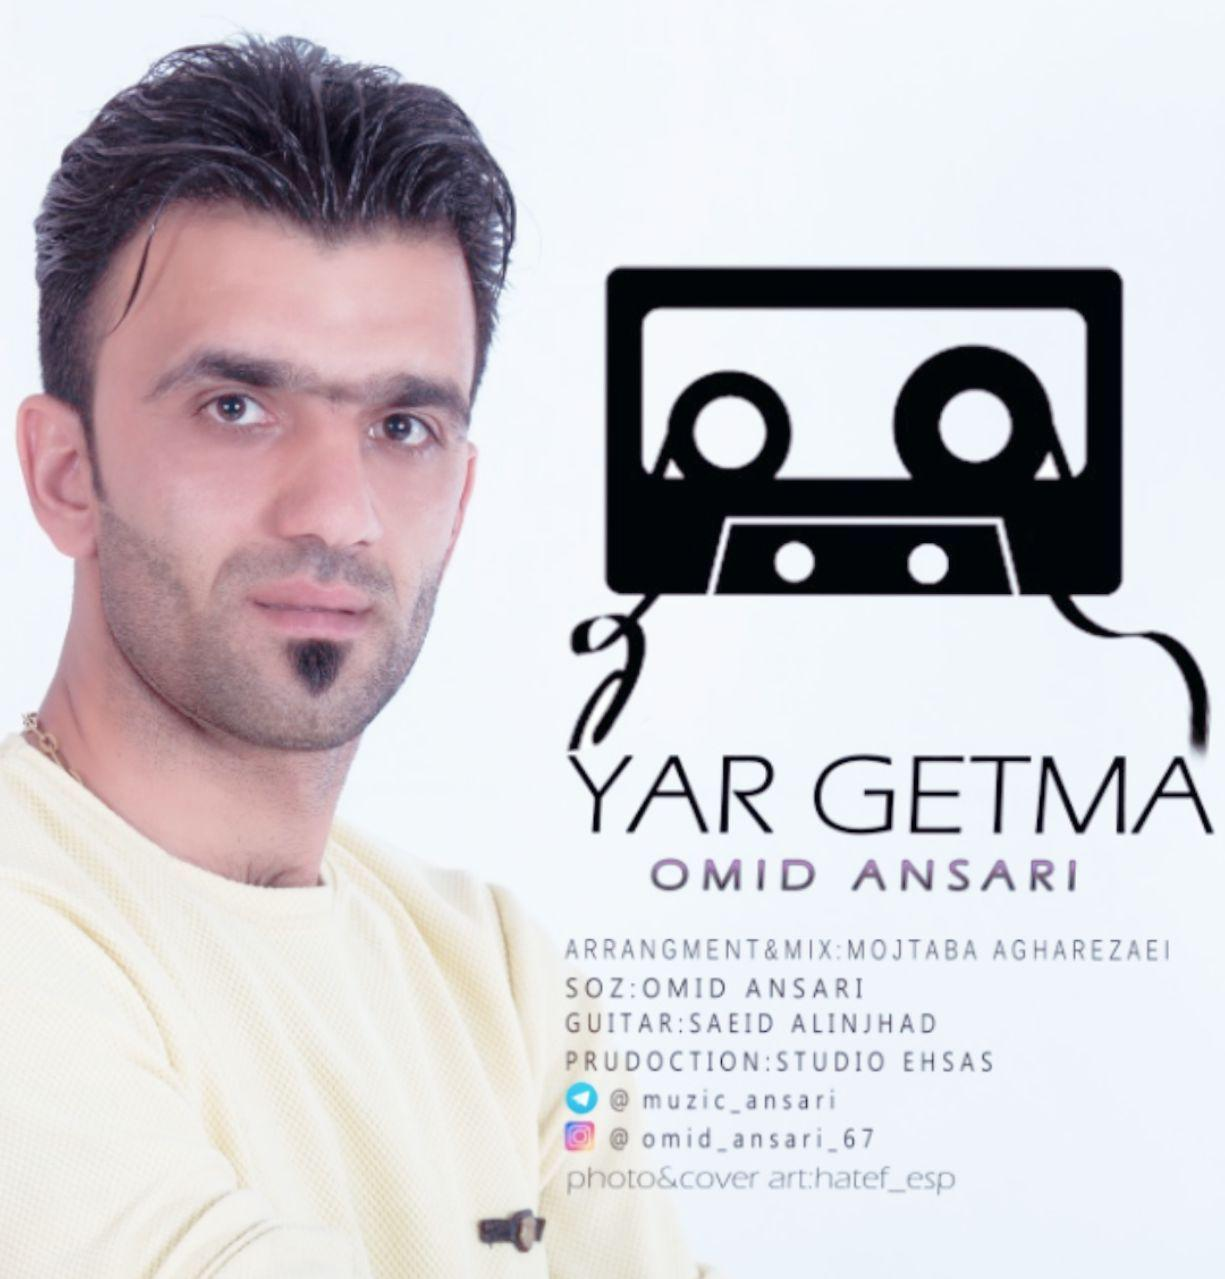 http://s8.picofile.com/file/8329877418/44Omid_Ansari_%E2%80%93_Yar_Getma.jpg